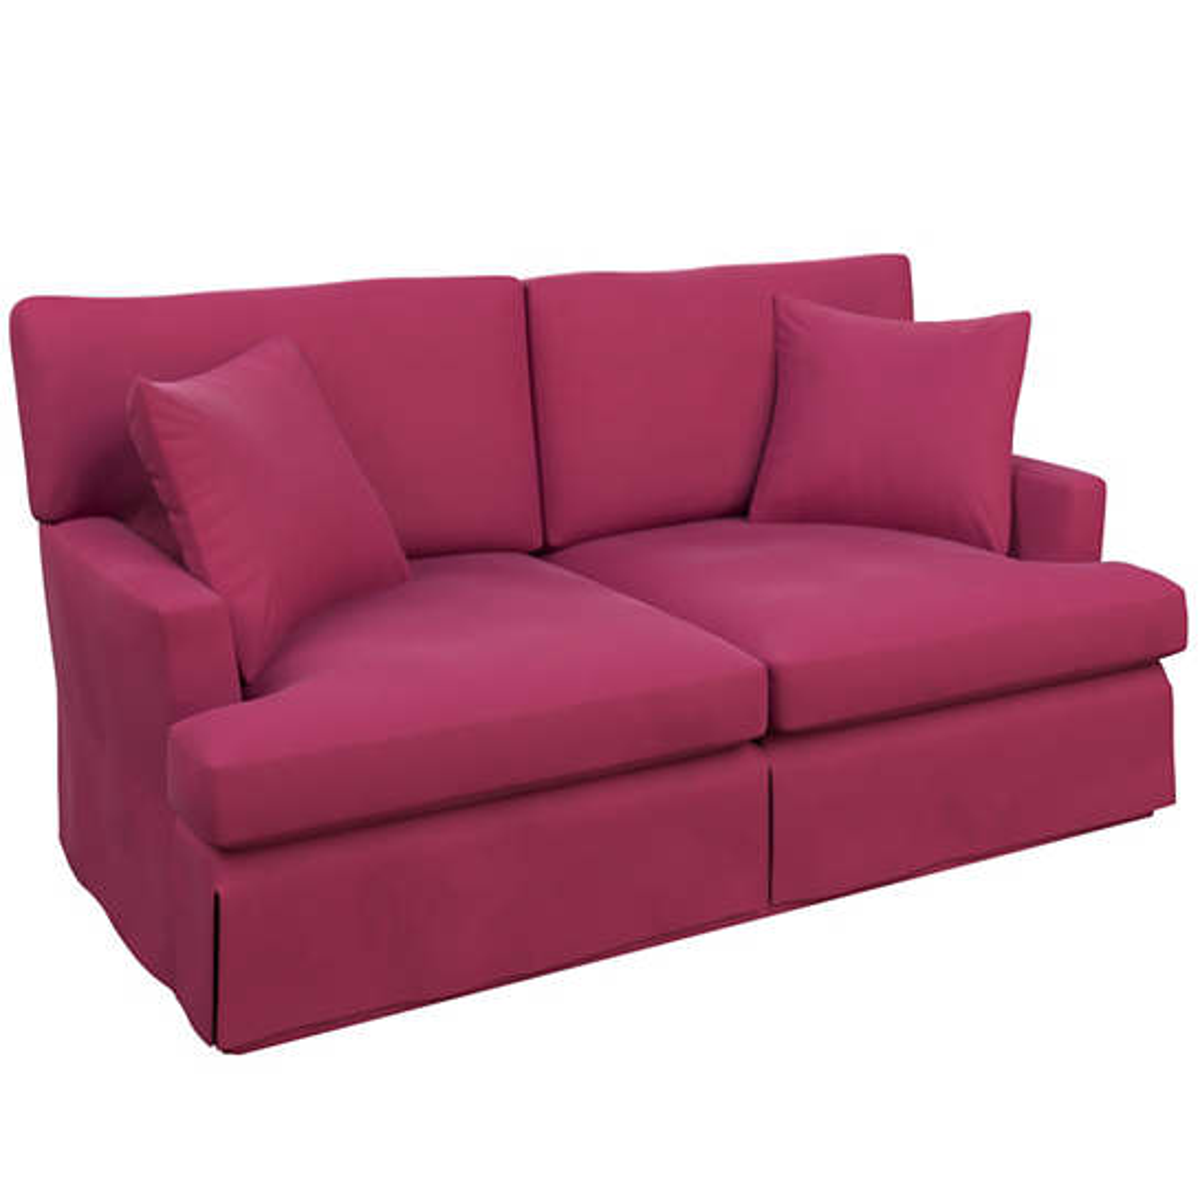 Velvesuede Magenta Saybrook 2 Seater Slipcovered Sofa